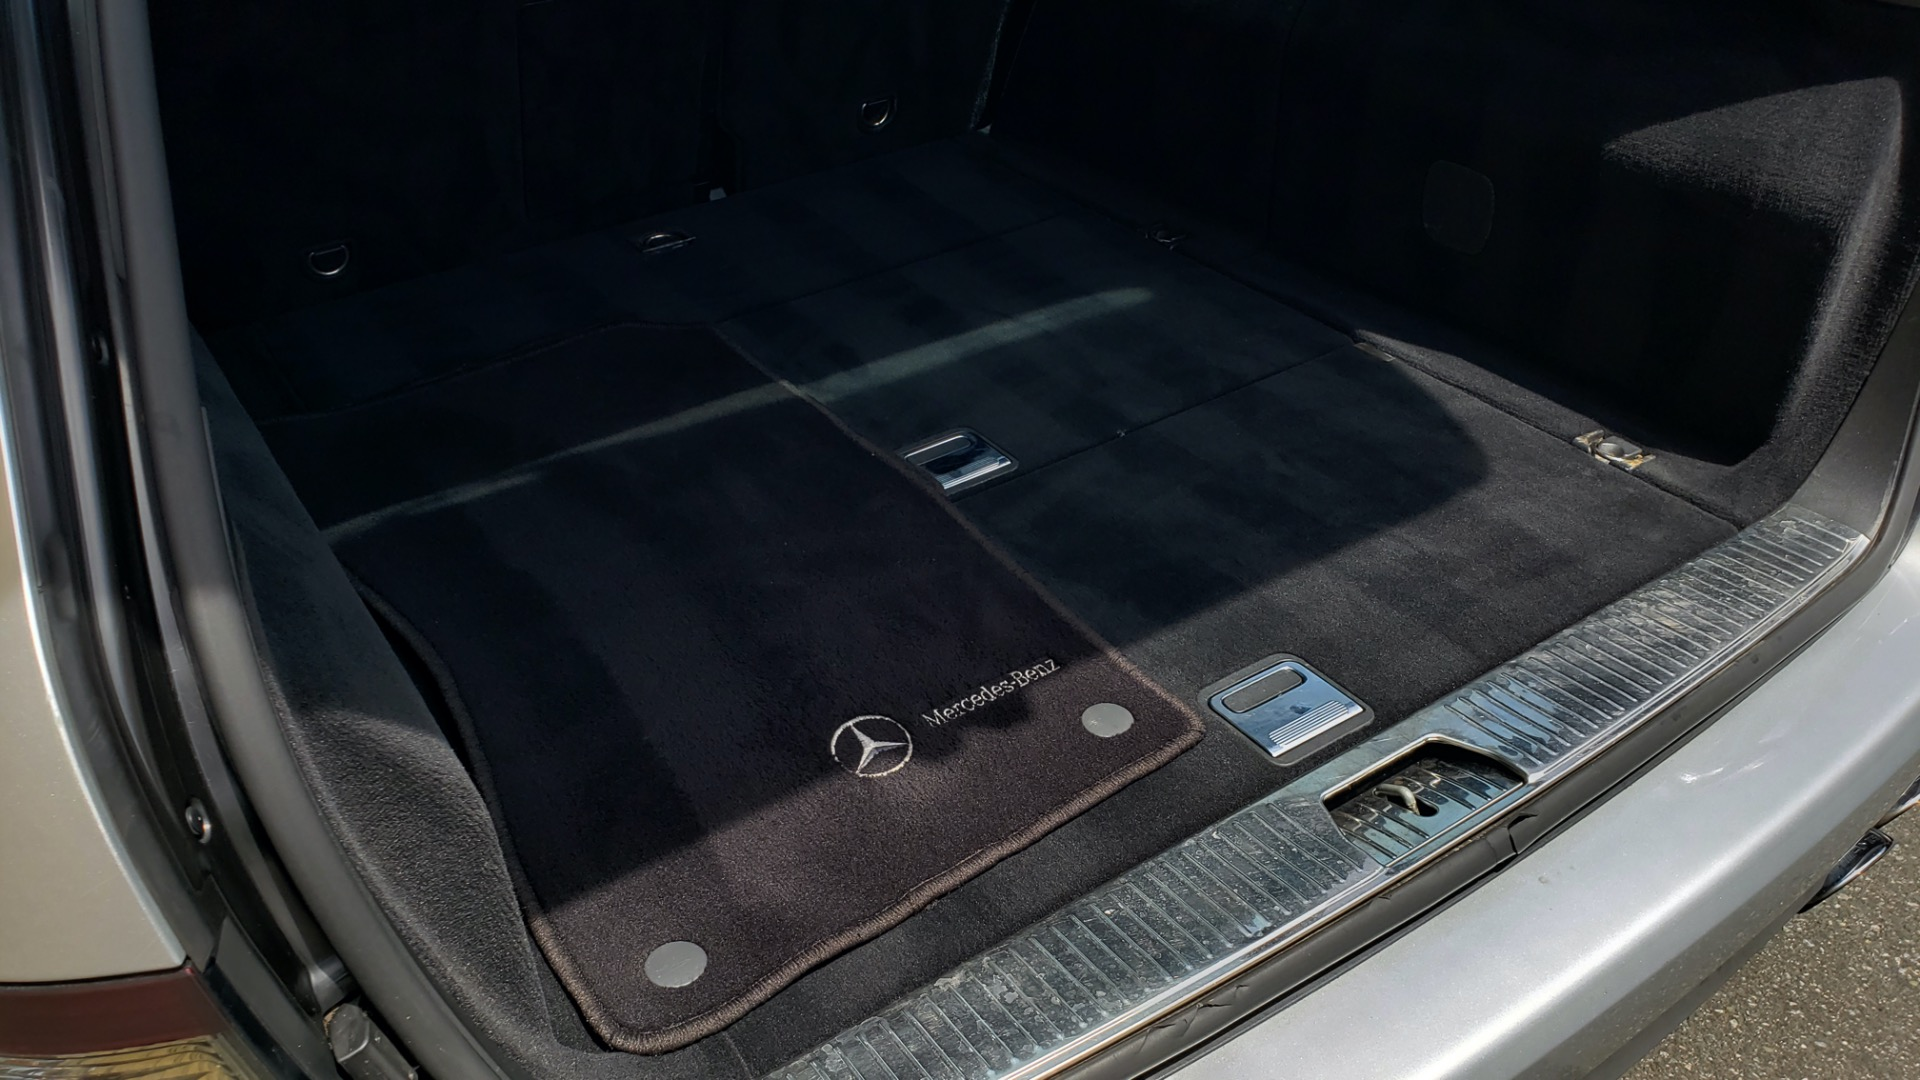 Used 2007 Mercedes-Benz E-Class E63 AMG WAGON / NAV / SUNROOF / HARMAN/KARDON for sale $29,000 at Formula Imports in Charlotte NC 28227 19